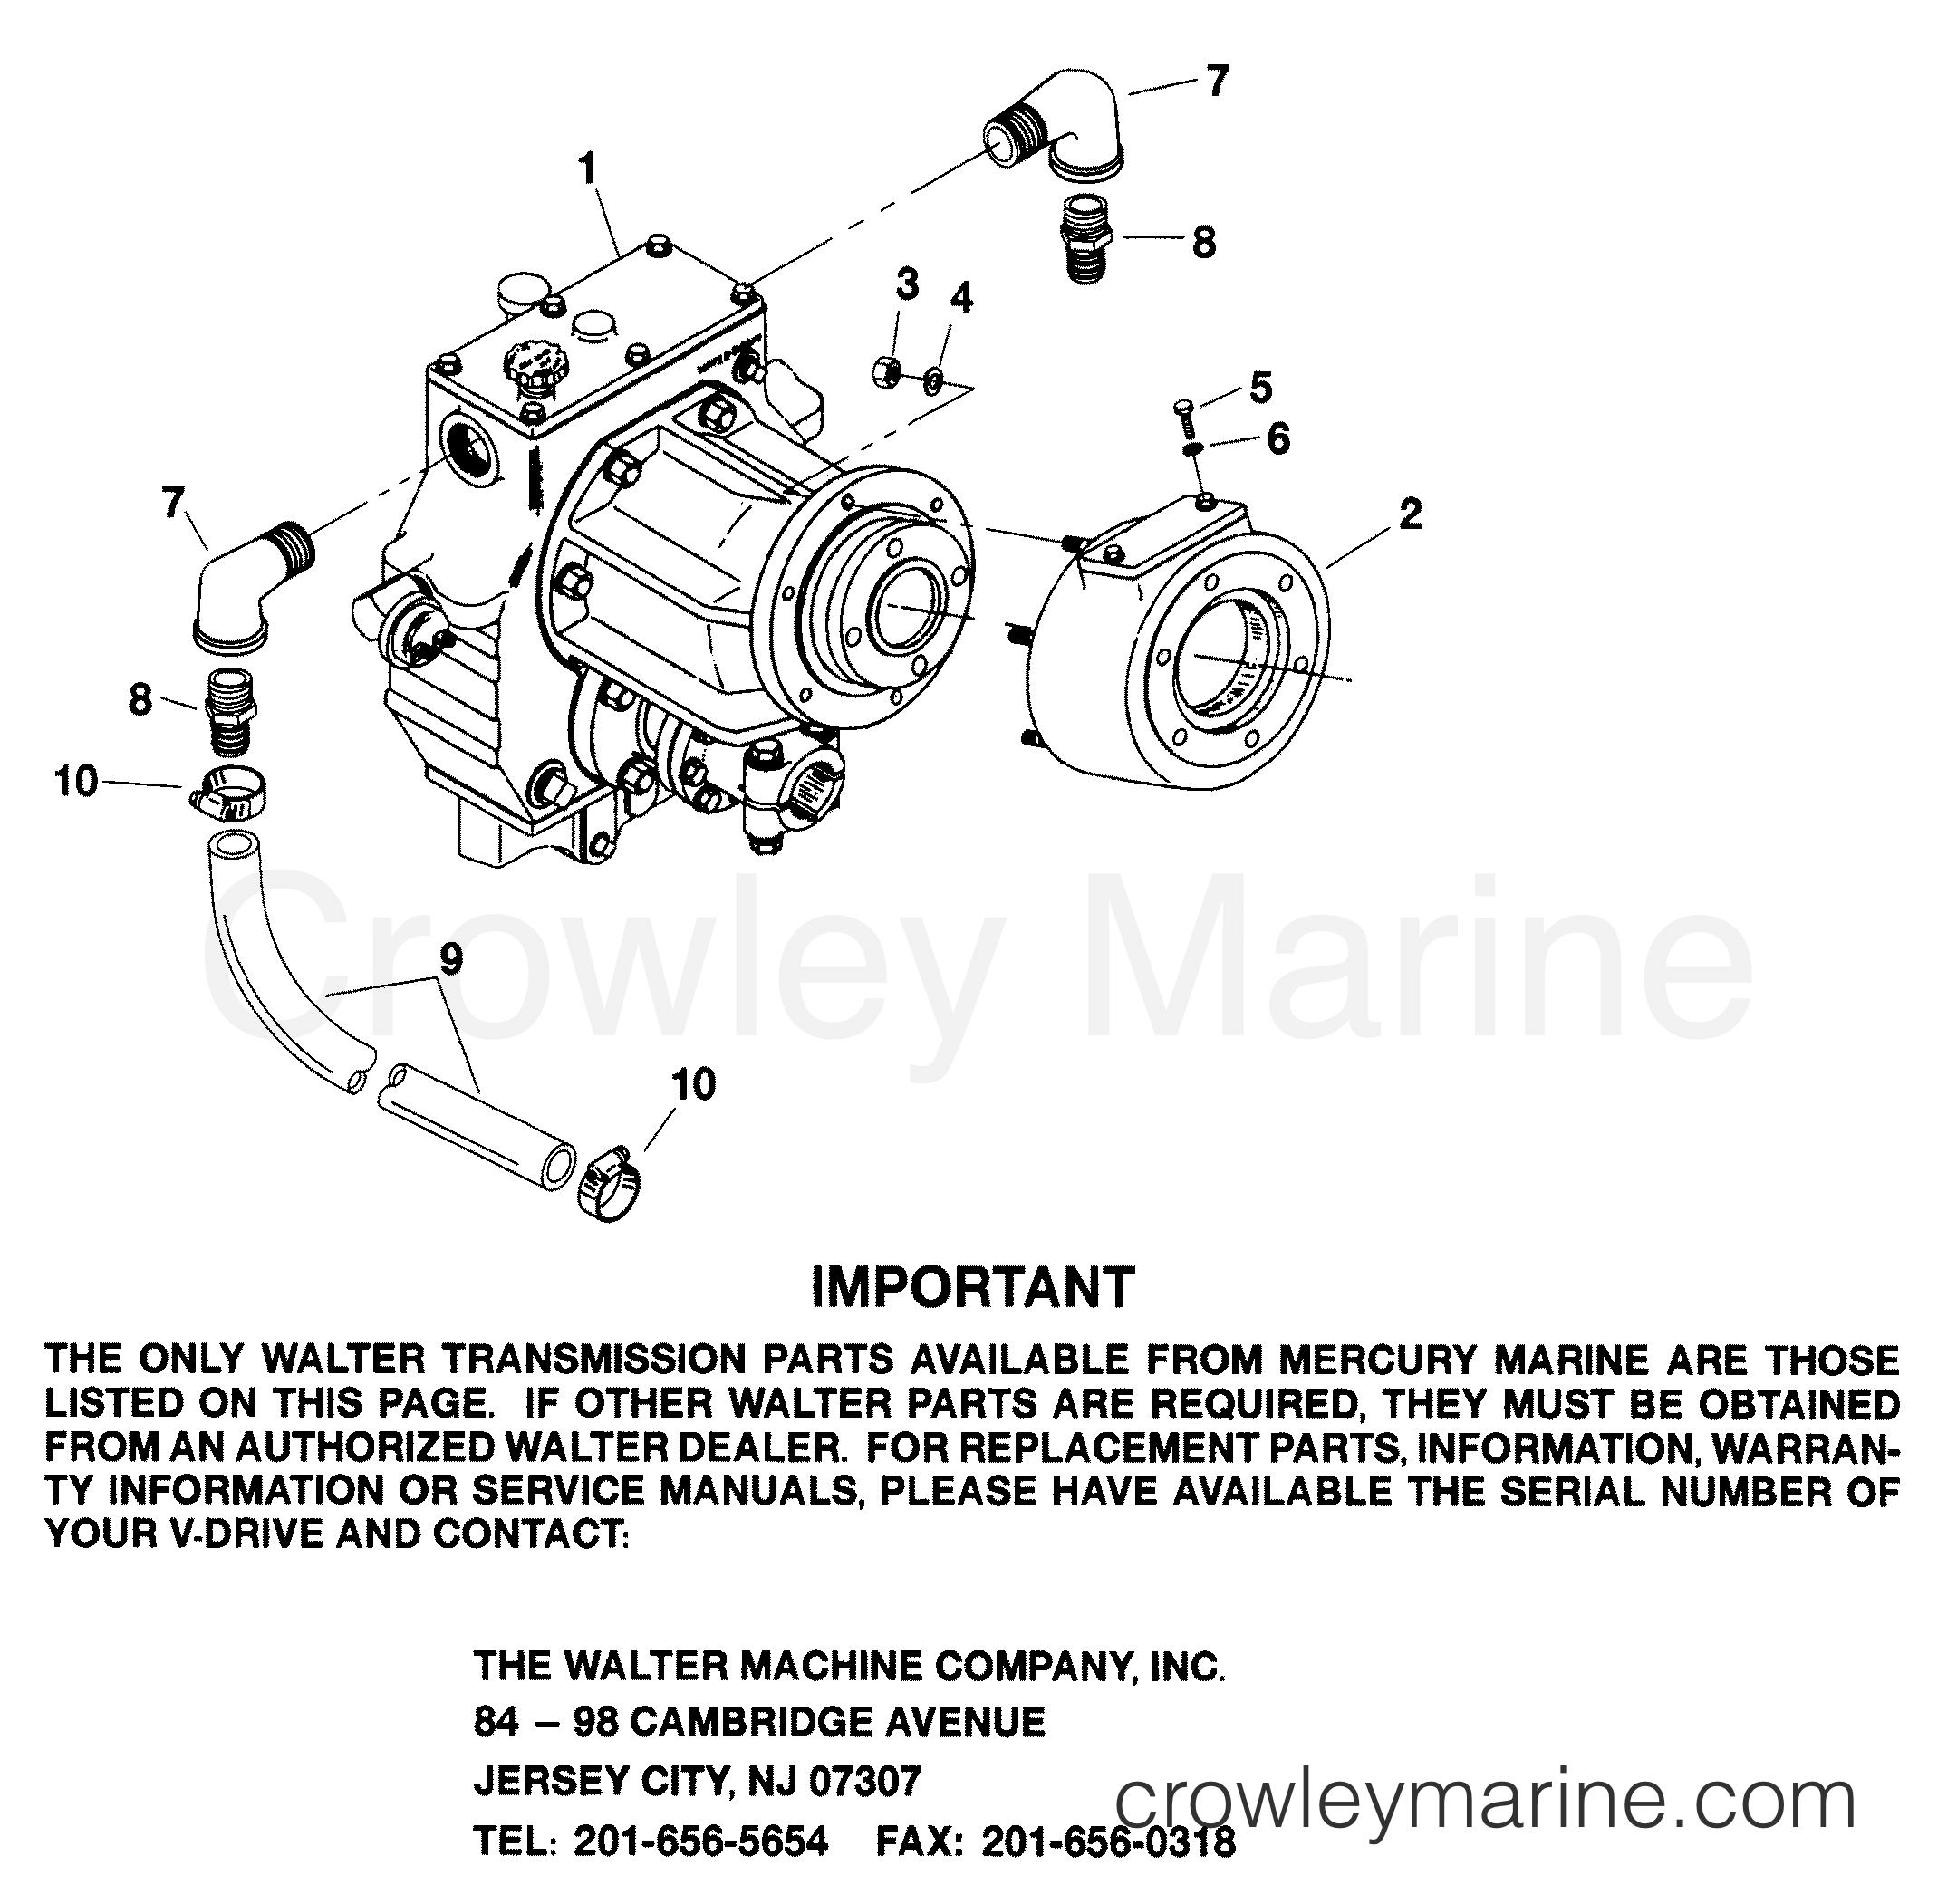 Mercury Marine Inboard Manuals Porsche Wds 24 Electrical Wiring Diagram Repair Manual Order Array Transmission V Drive Walter 1997 Engine 350 Rh Crowleymarine Com